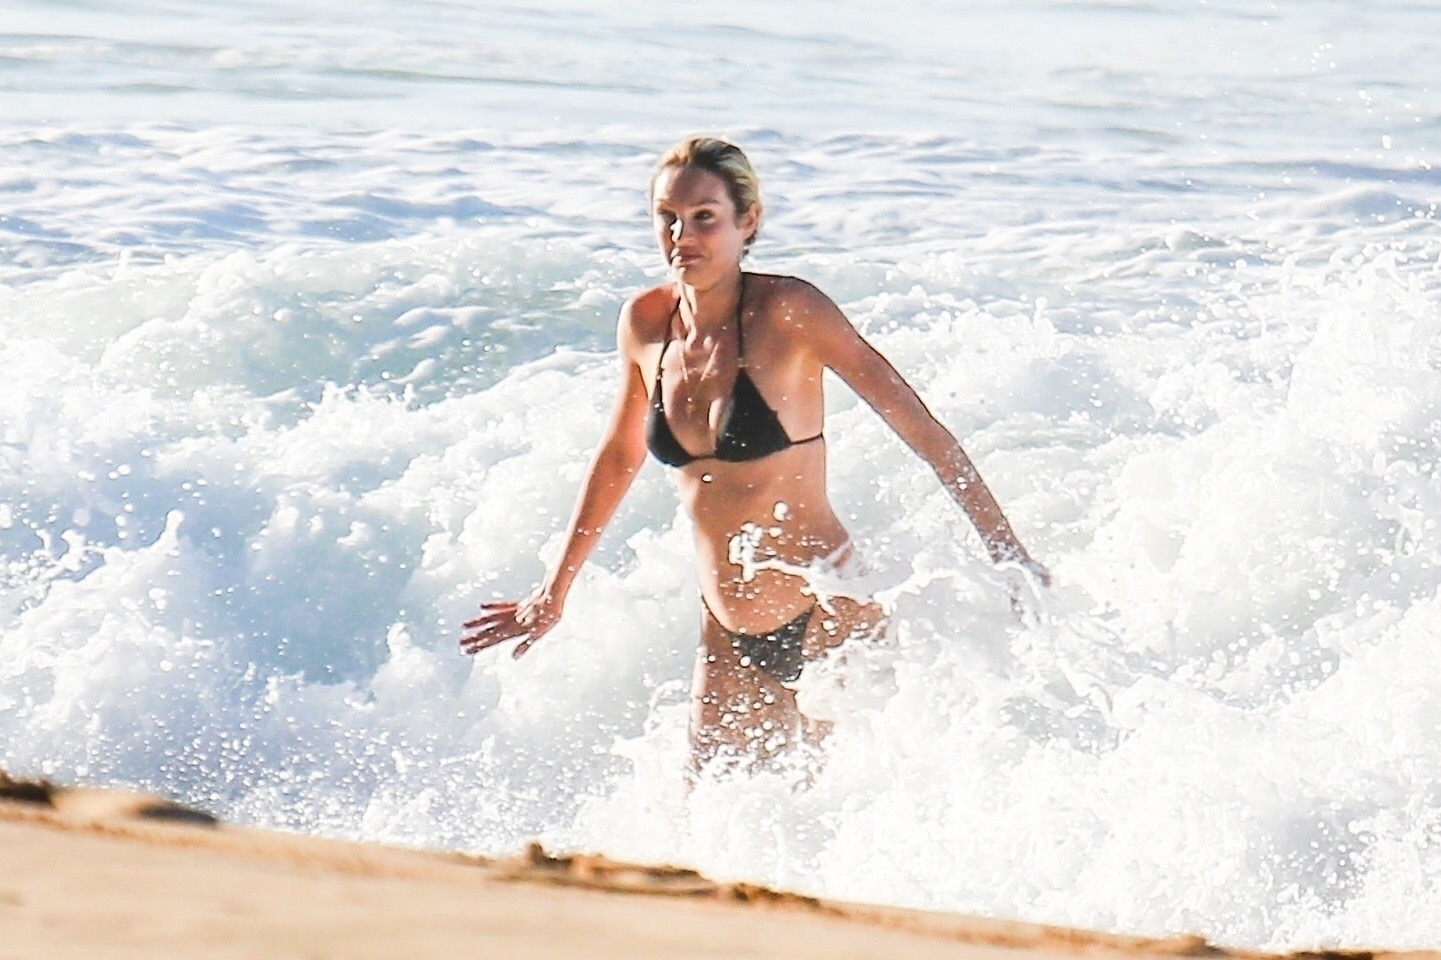 Candice Swanepoel 2017 : Candice Swanepoel in Black Bikini 2017 -41